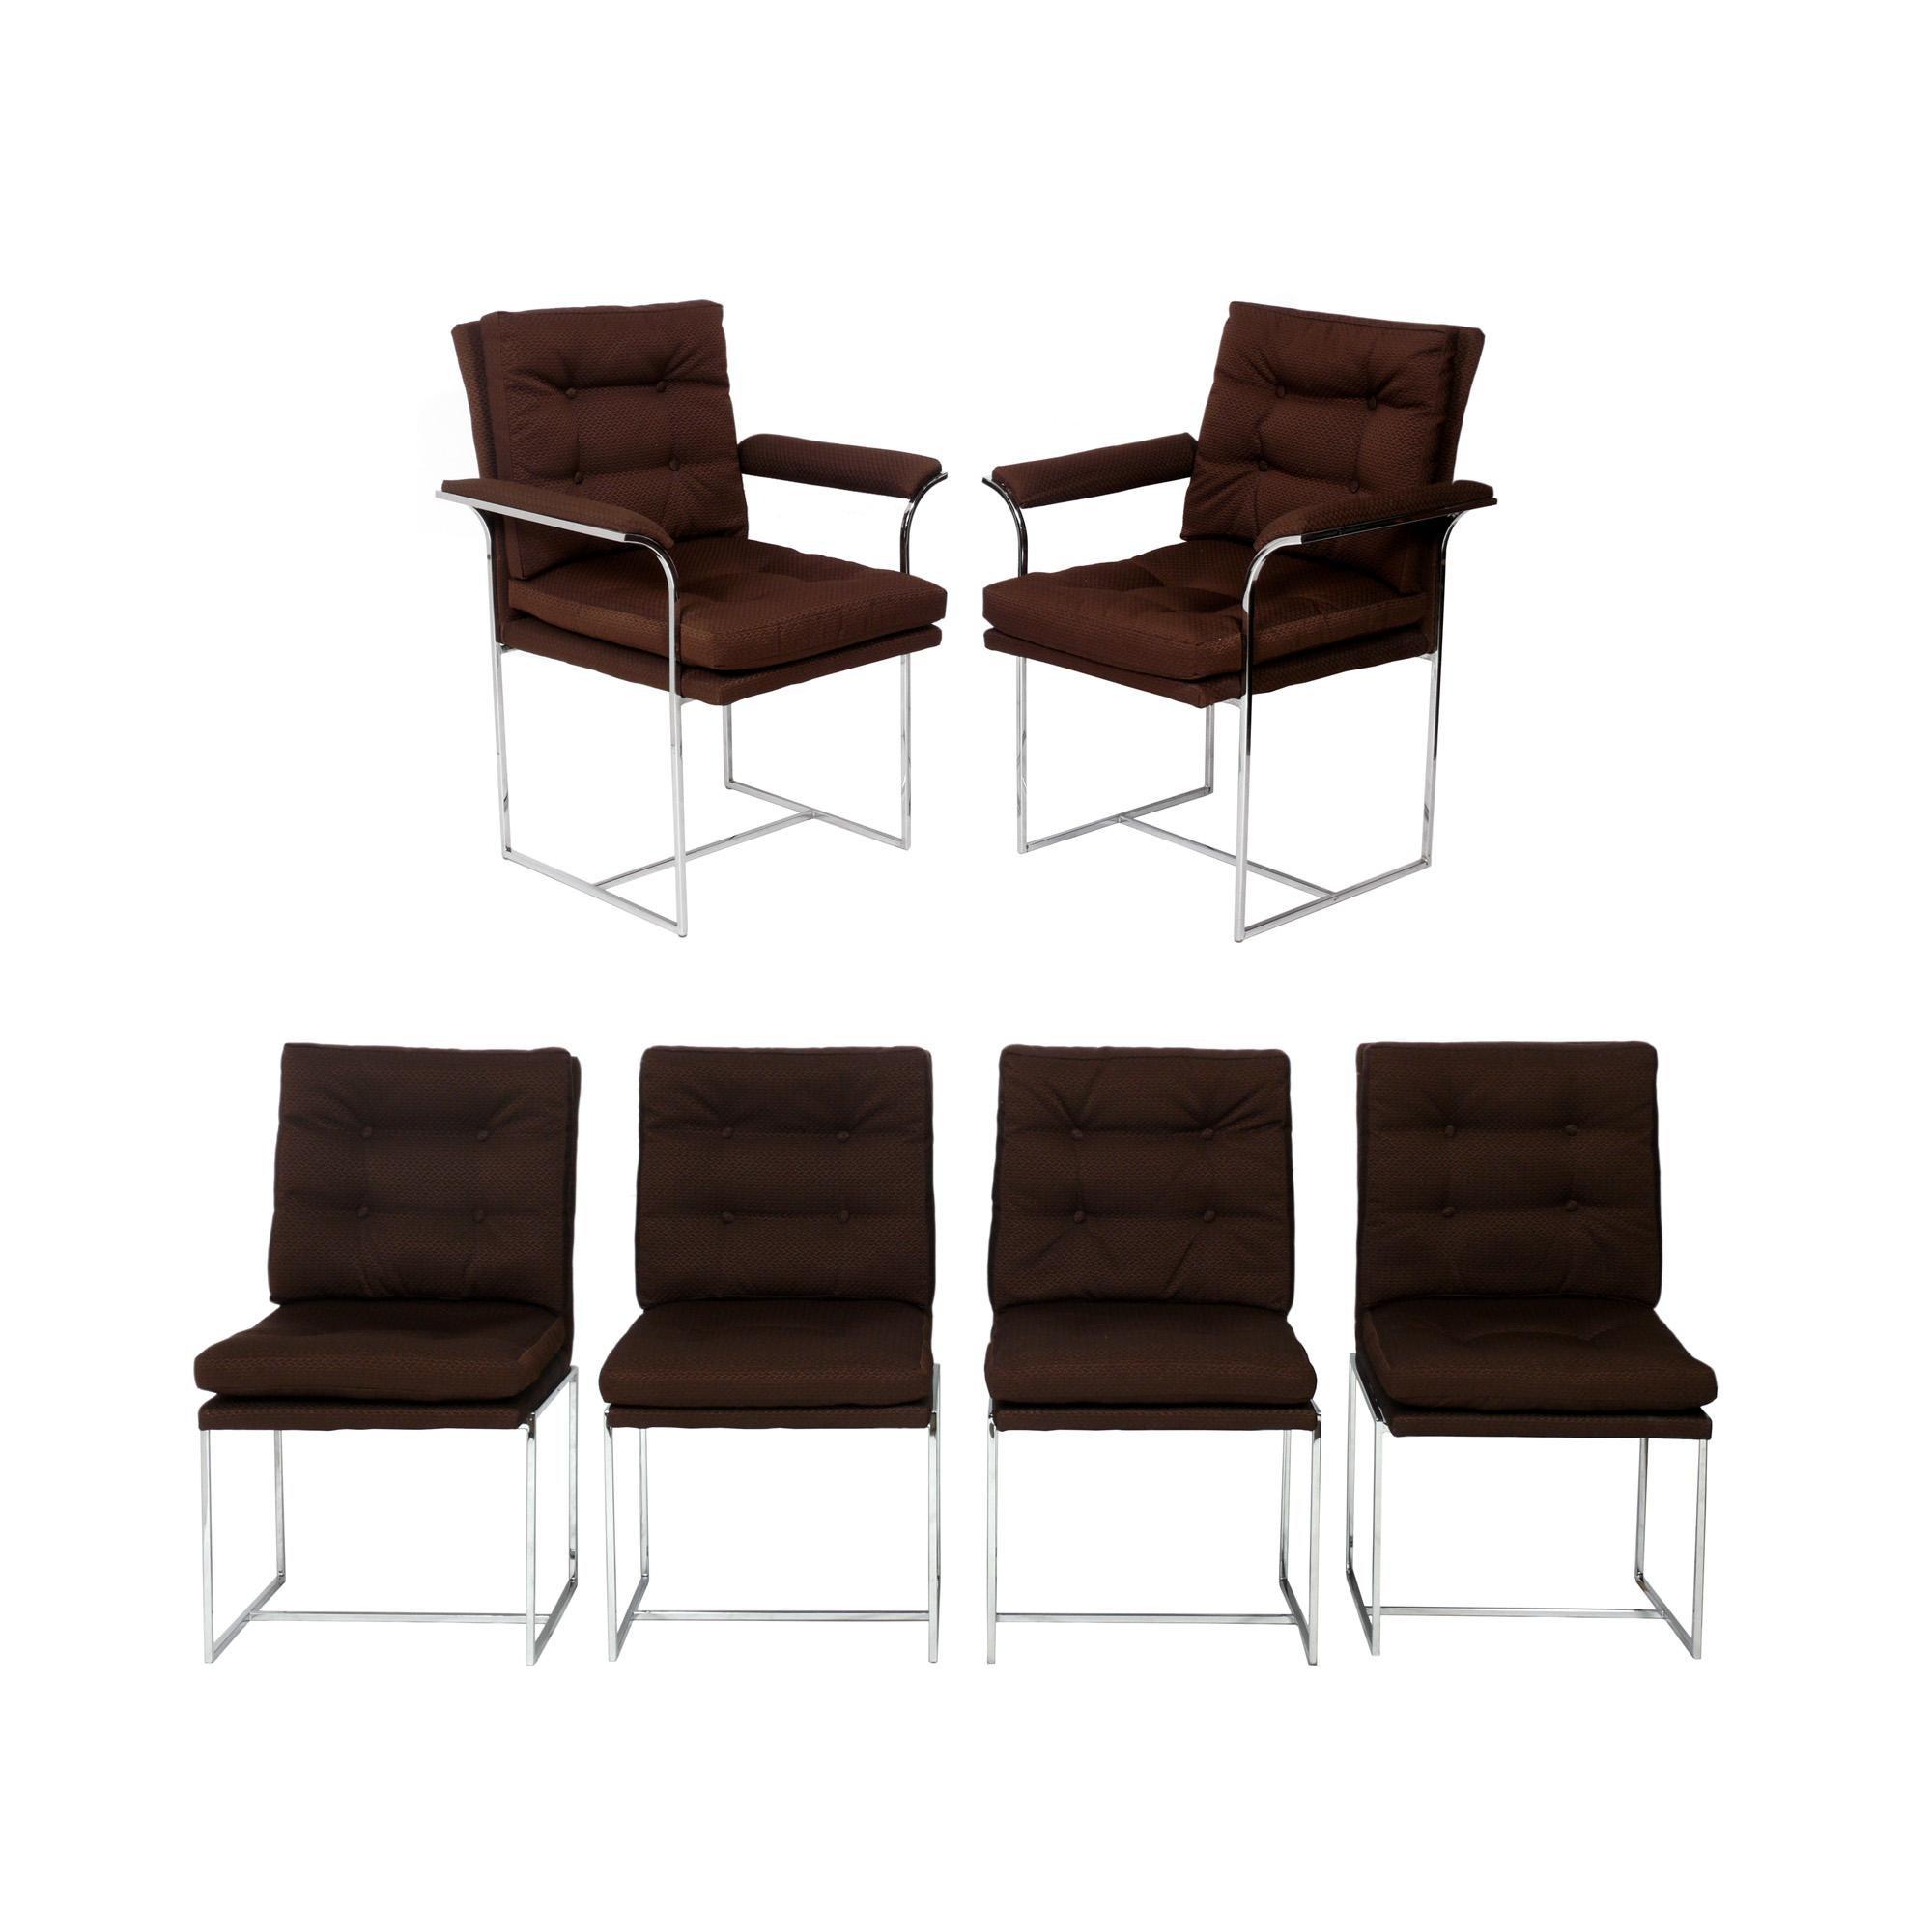 Milo Baughman Dining Chairs, Set of Six